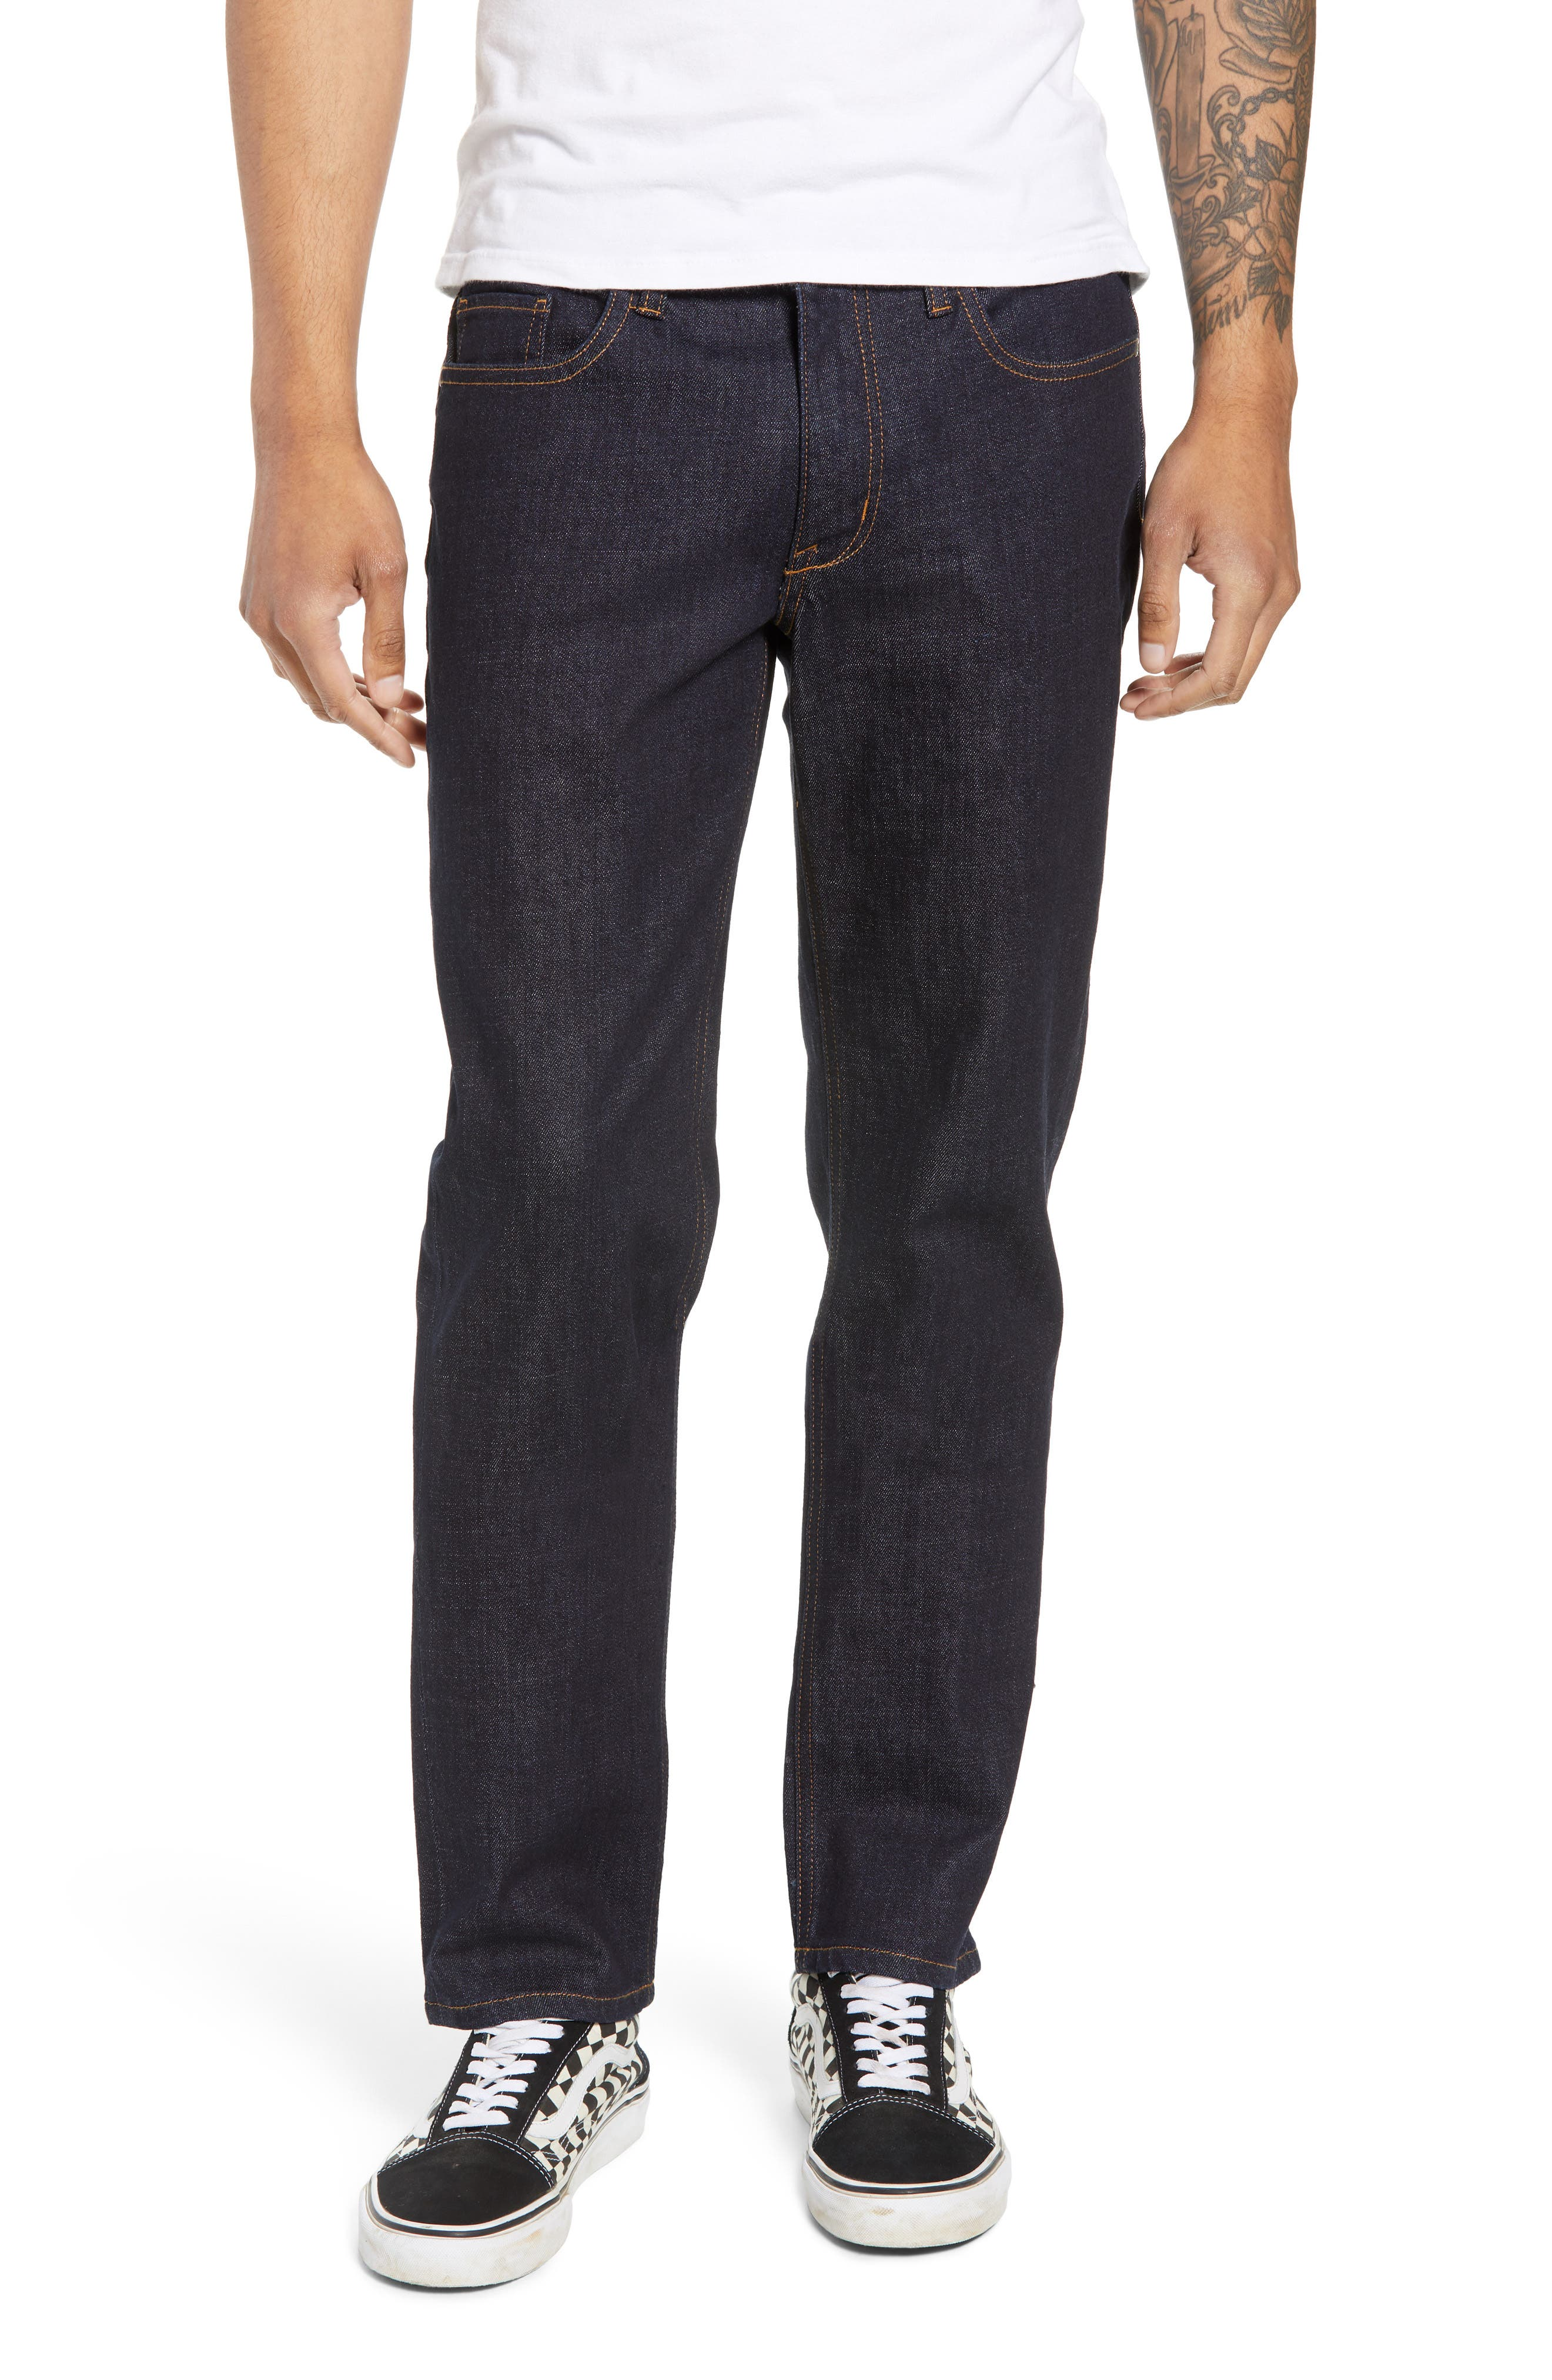 Stretch Slim Leg Jeans by The Rail